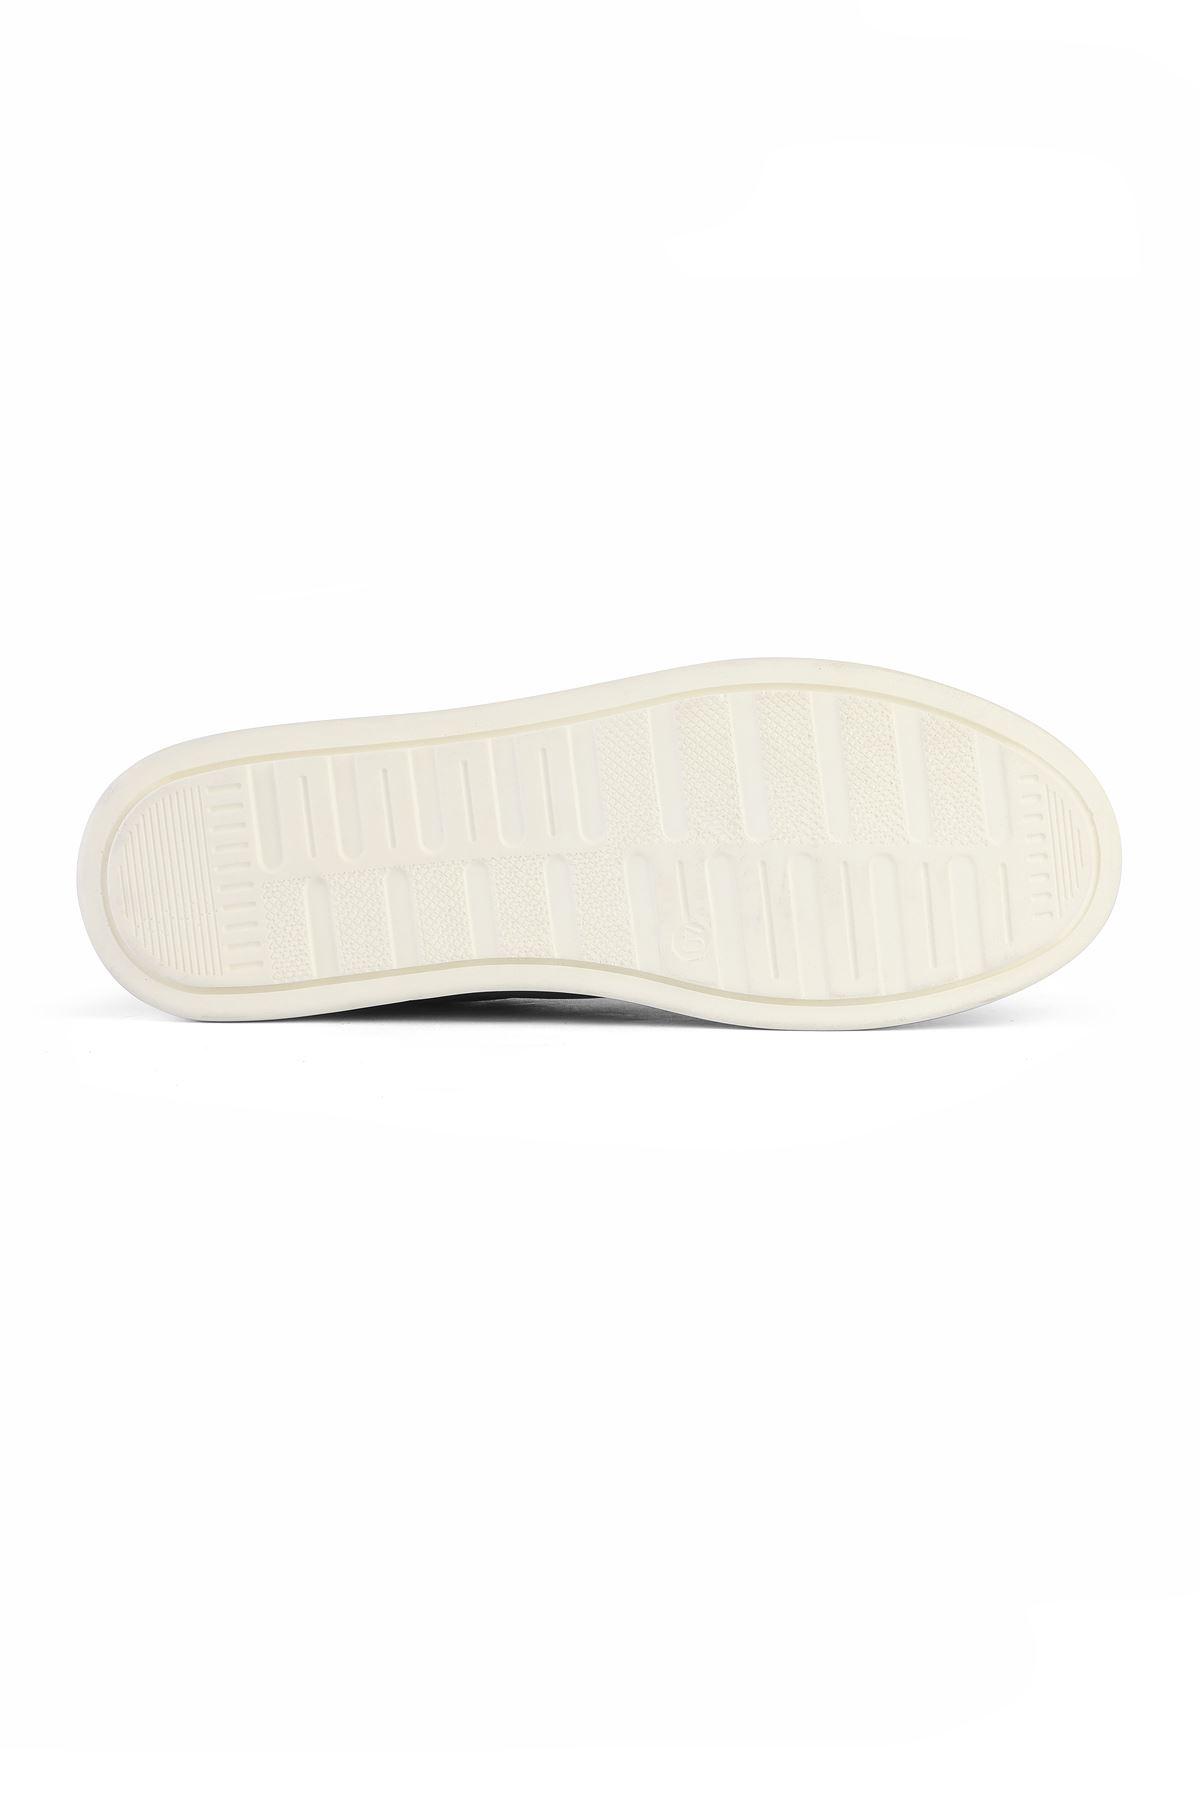 Libero 3308 Black Casual Shoes